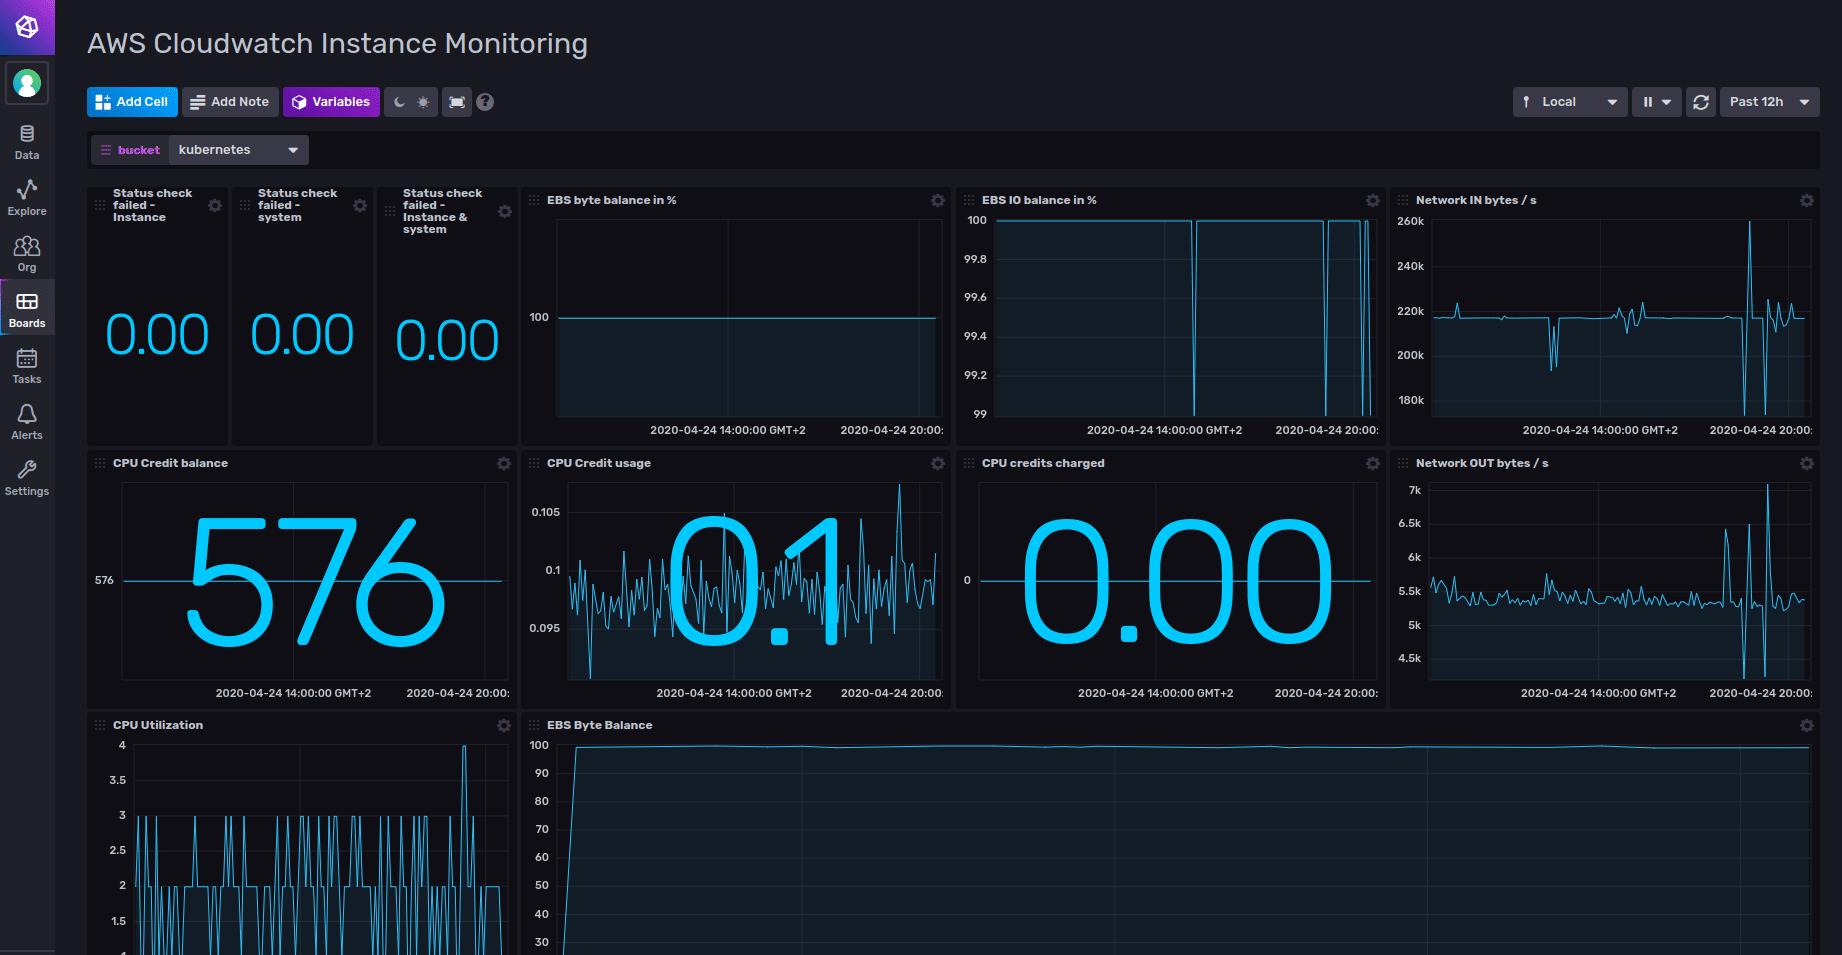 AWS Cloudwatch Instance Monitoring Dashboard